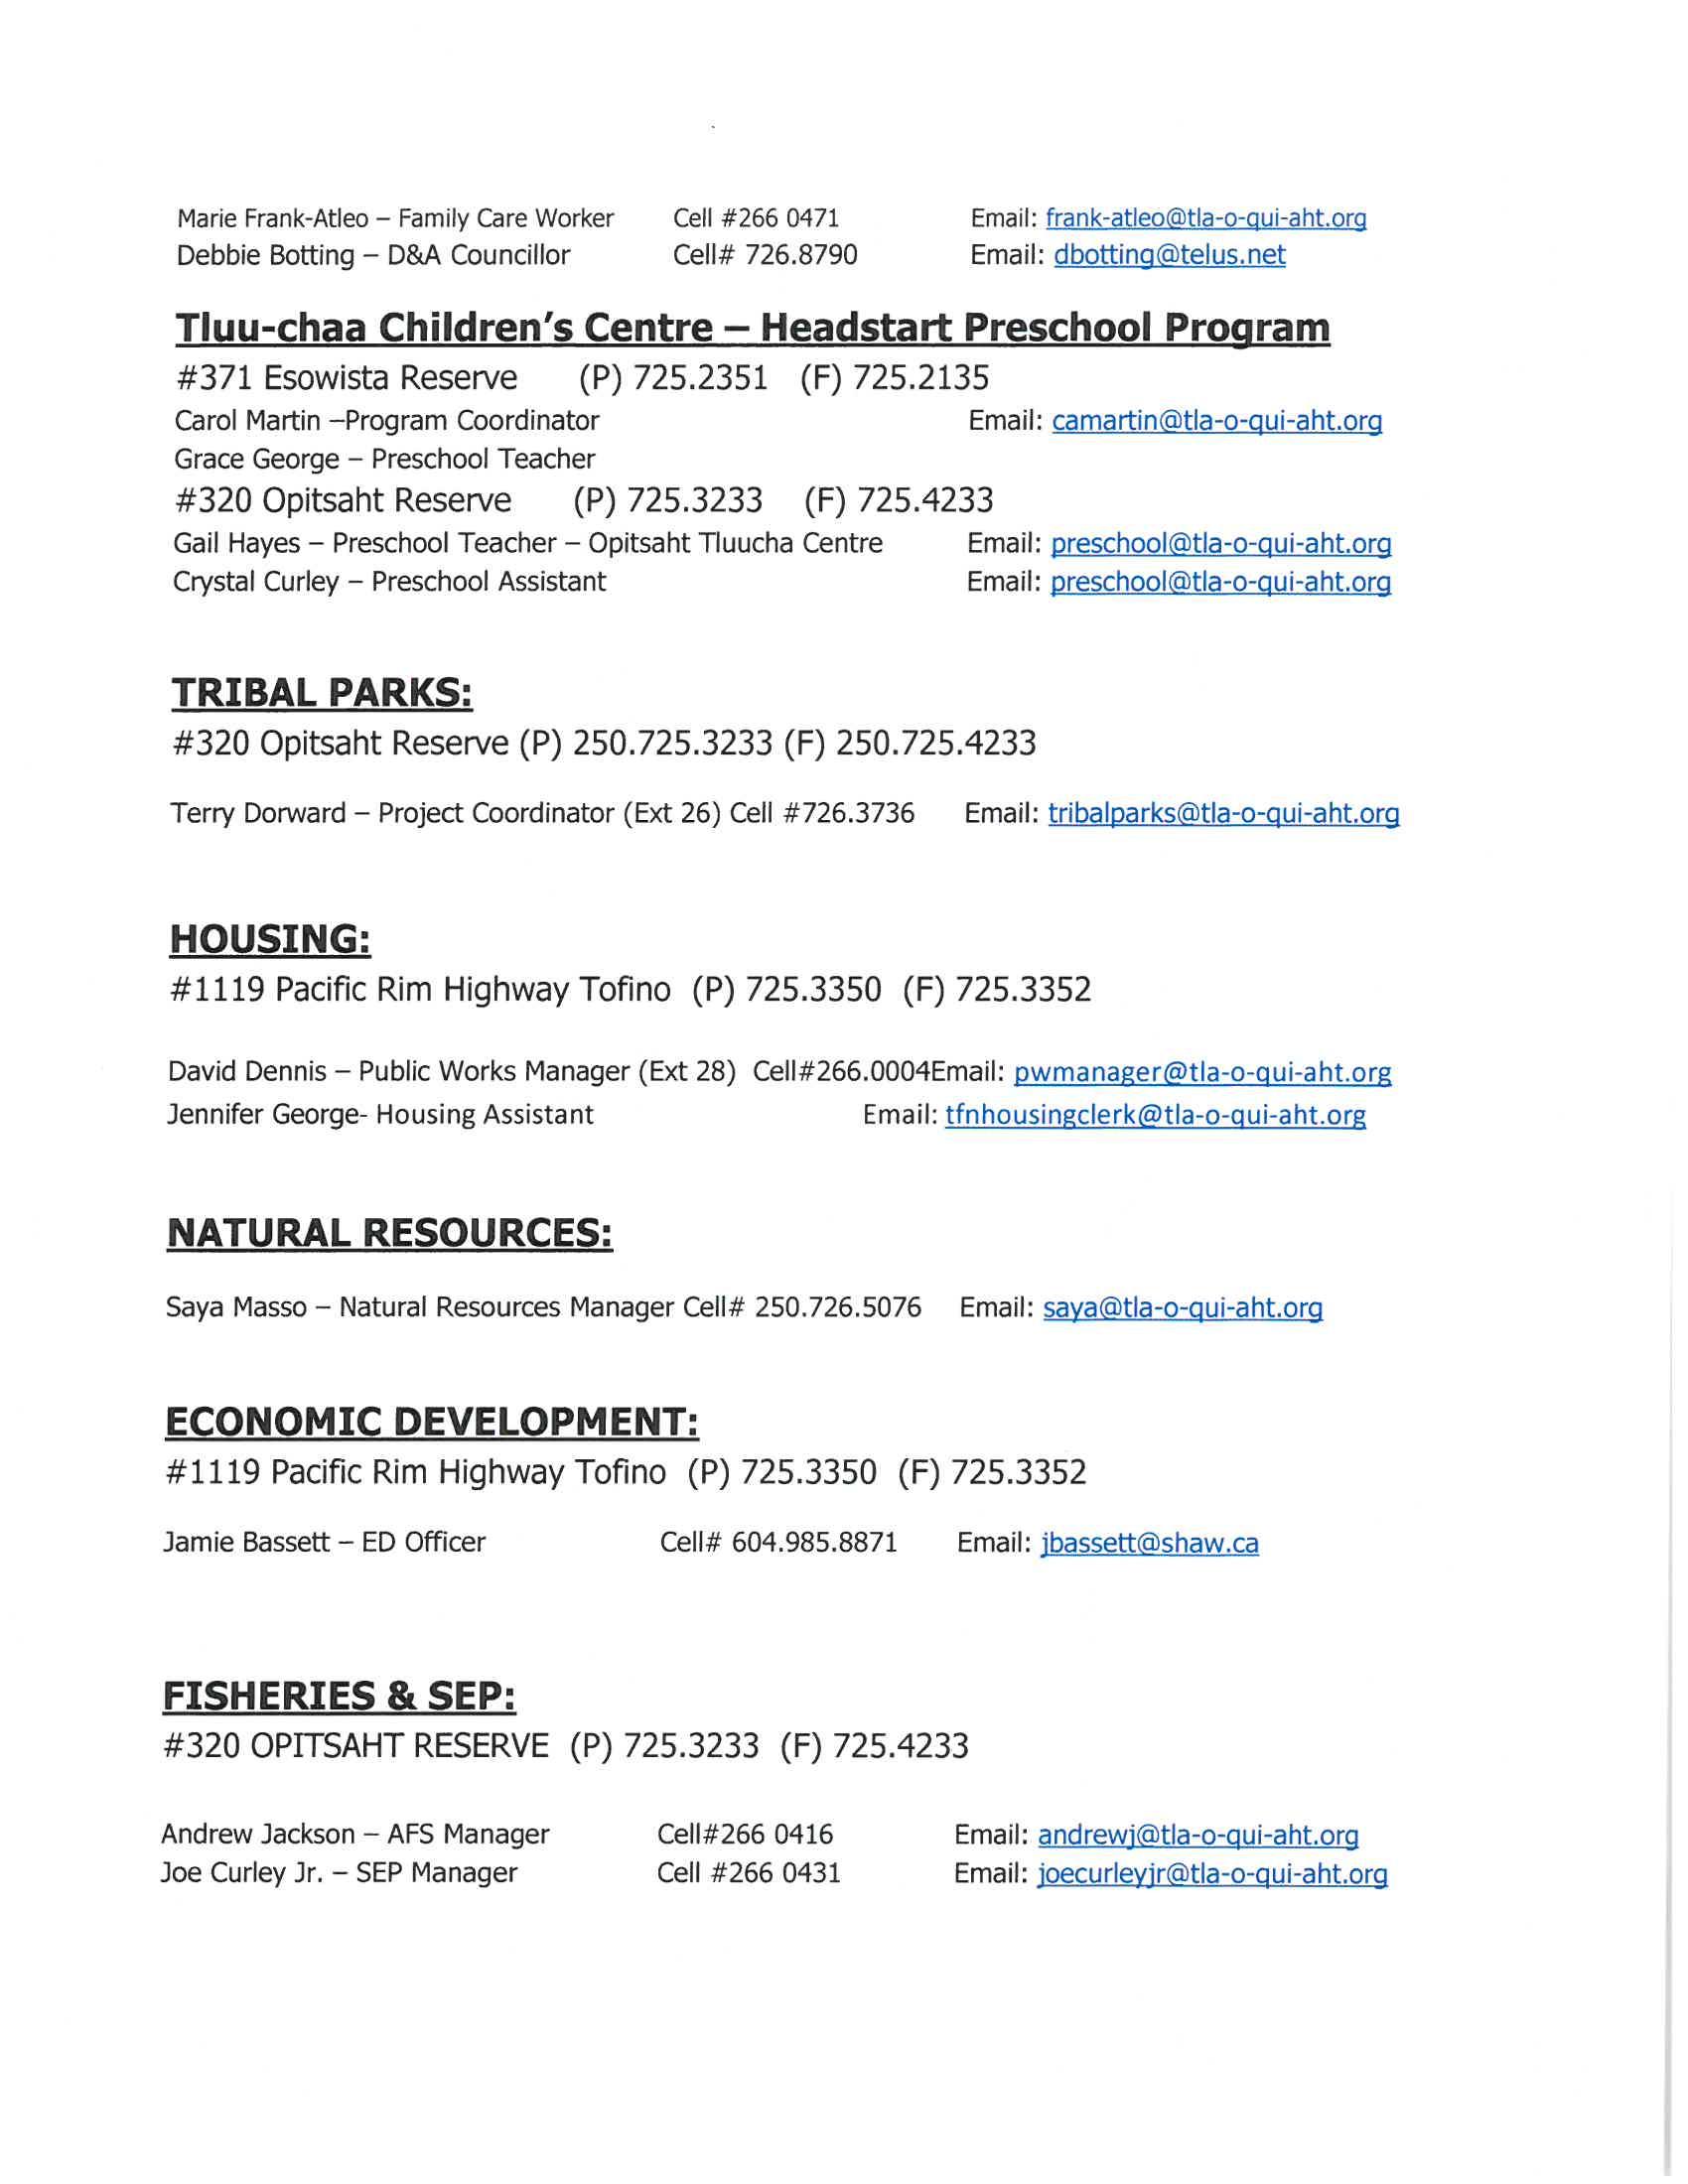 TFN Bulletin Apr 6-2016_Page_17.jpg